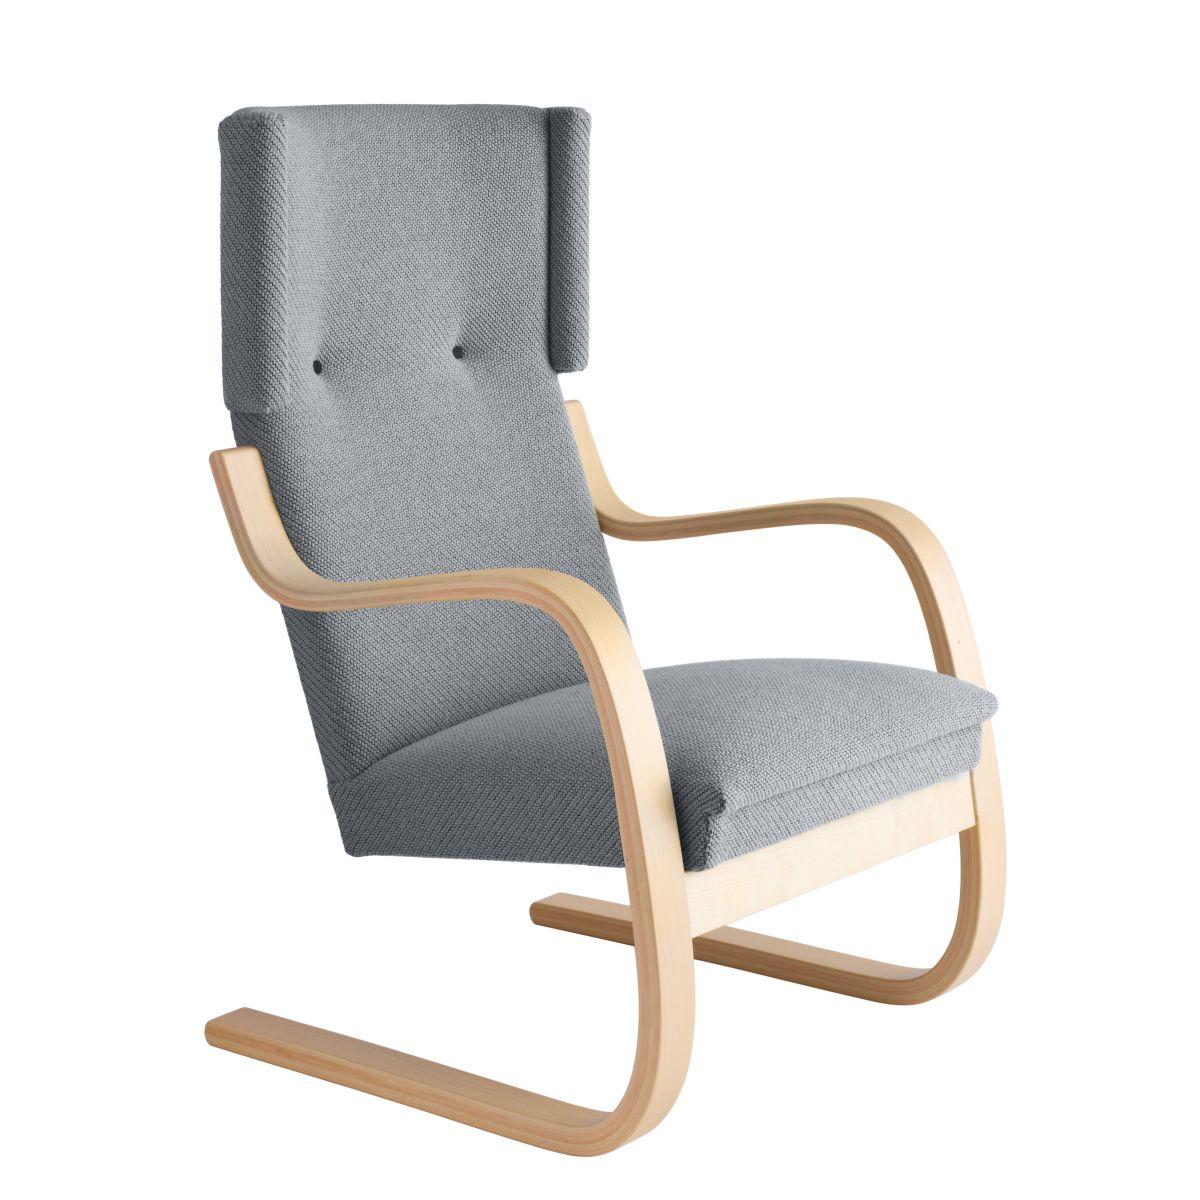 Armchair 401 Birch Clear Laquer Seat Fabric Upholstery Artek Grey 2494502